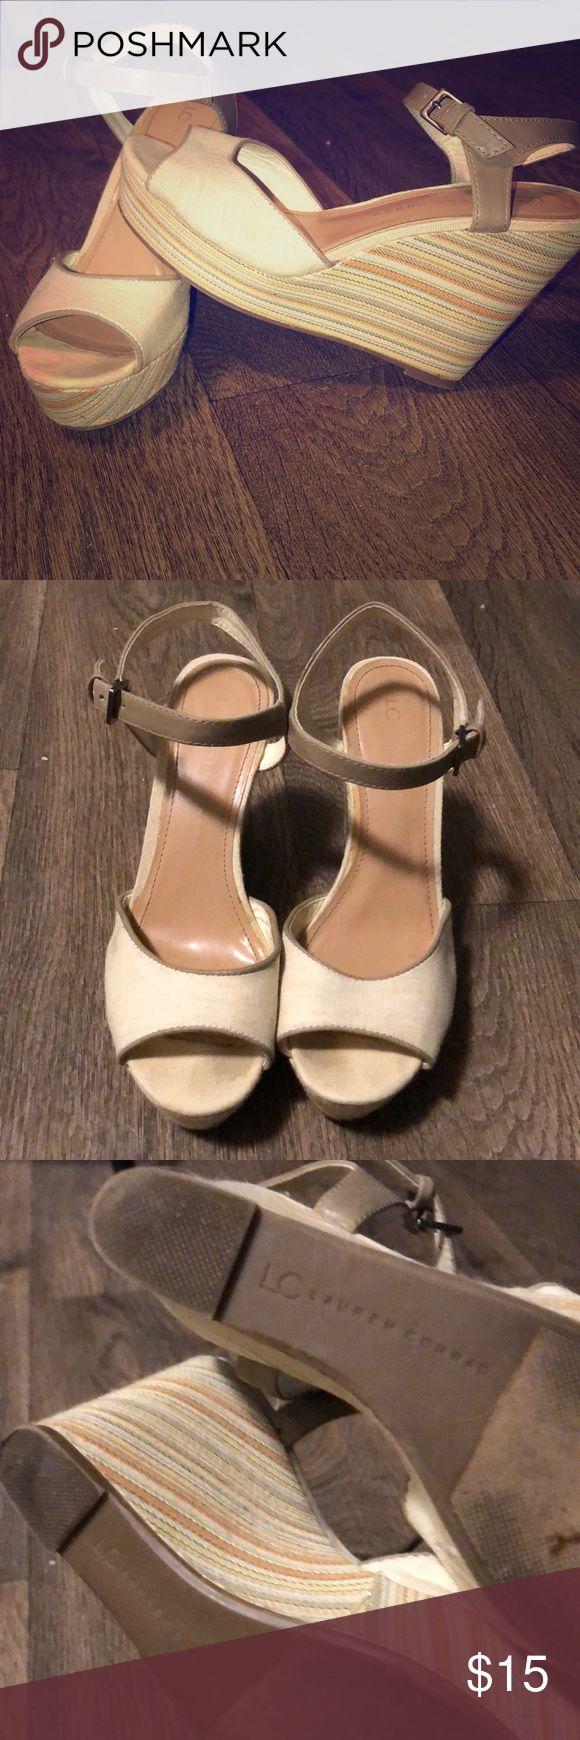 LC Open Toed Wedge Sandals Lauren Conrad multi colored wedge sandals. LC Lauren Conrad Shoes Wedges